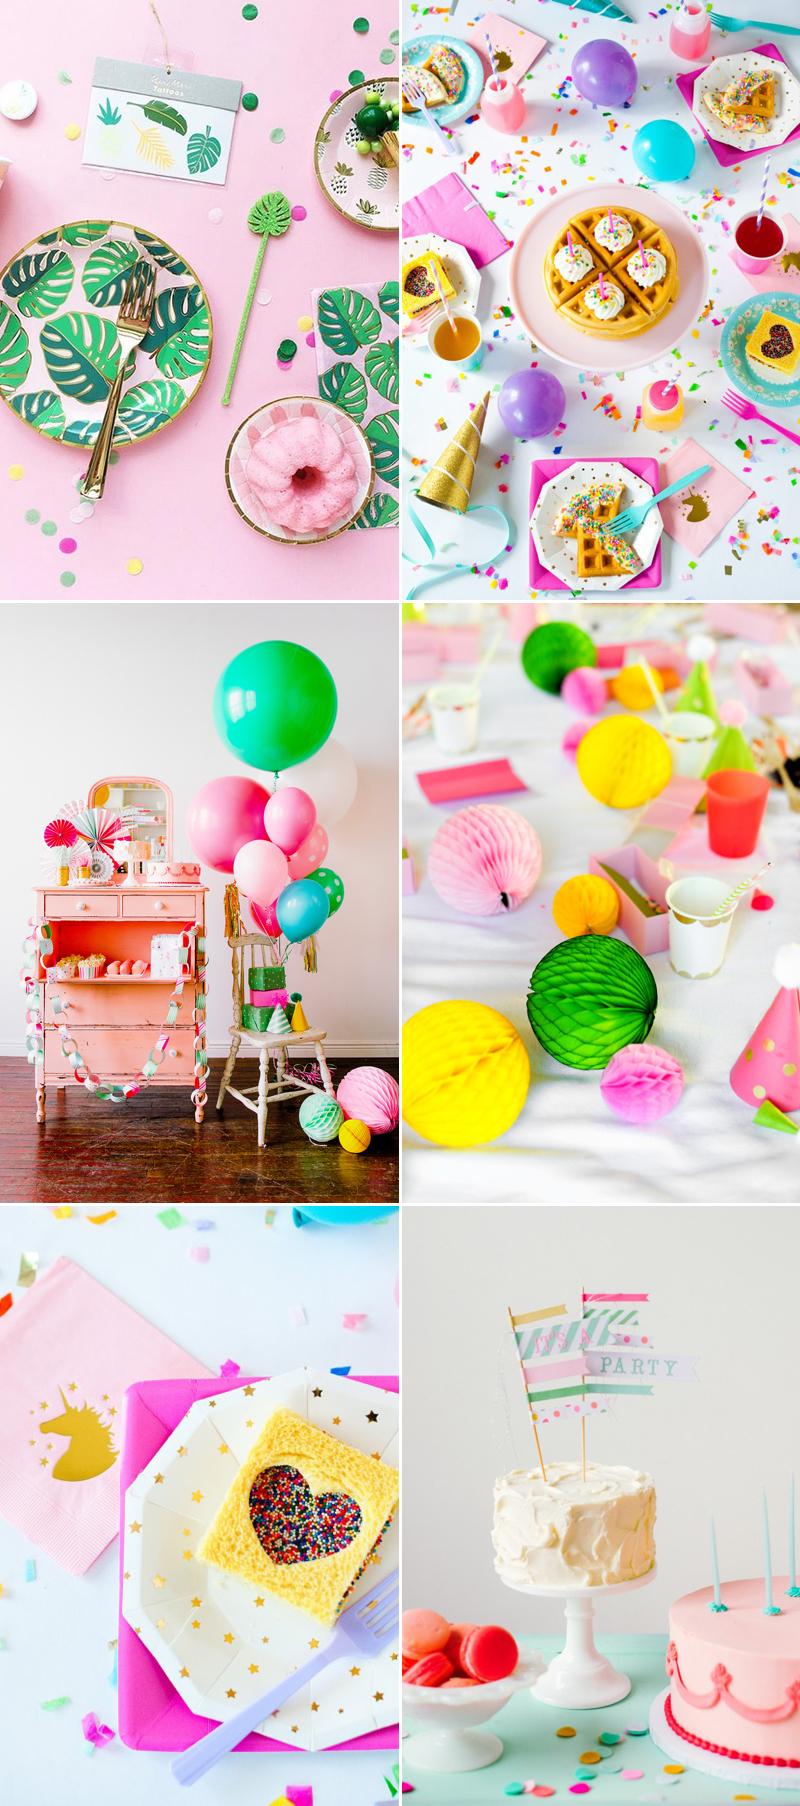 DIY Party01-ShopSweetLulu